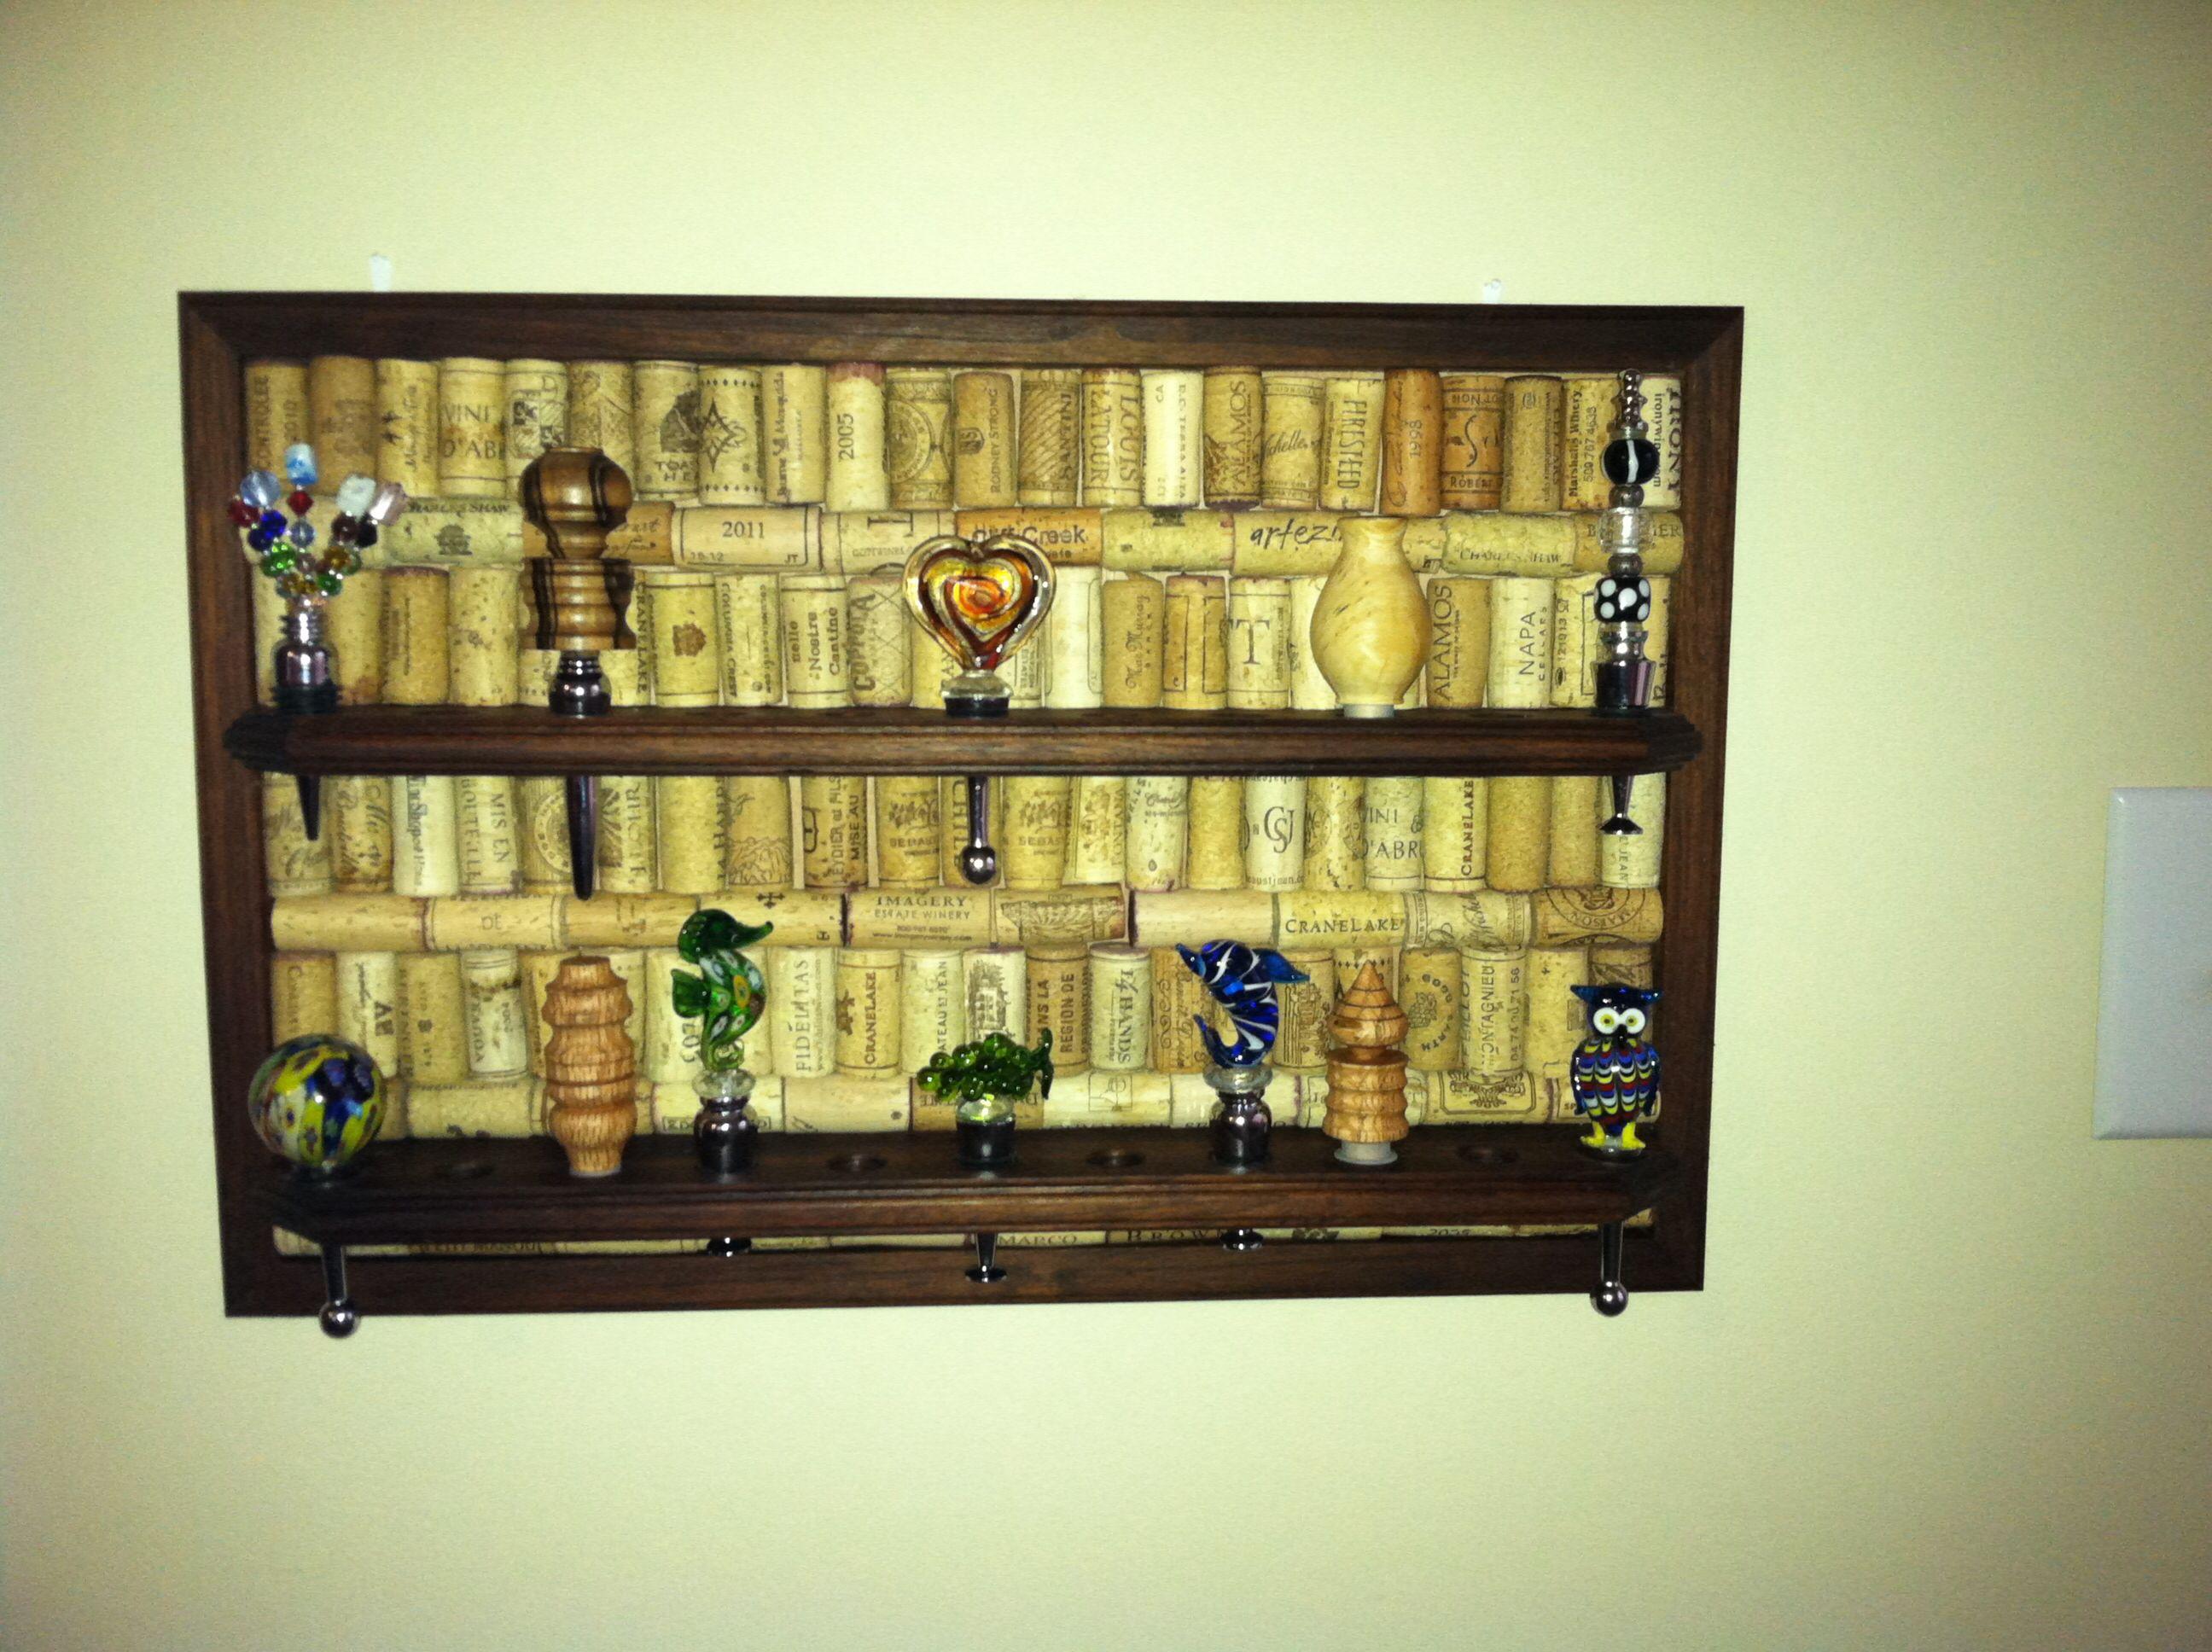 Cork board wine bottle bottle stoppers hand made   Crafts ...